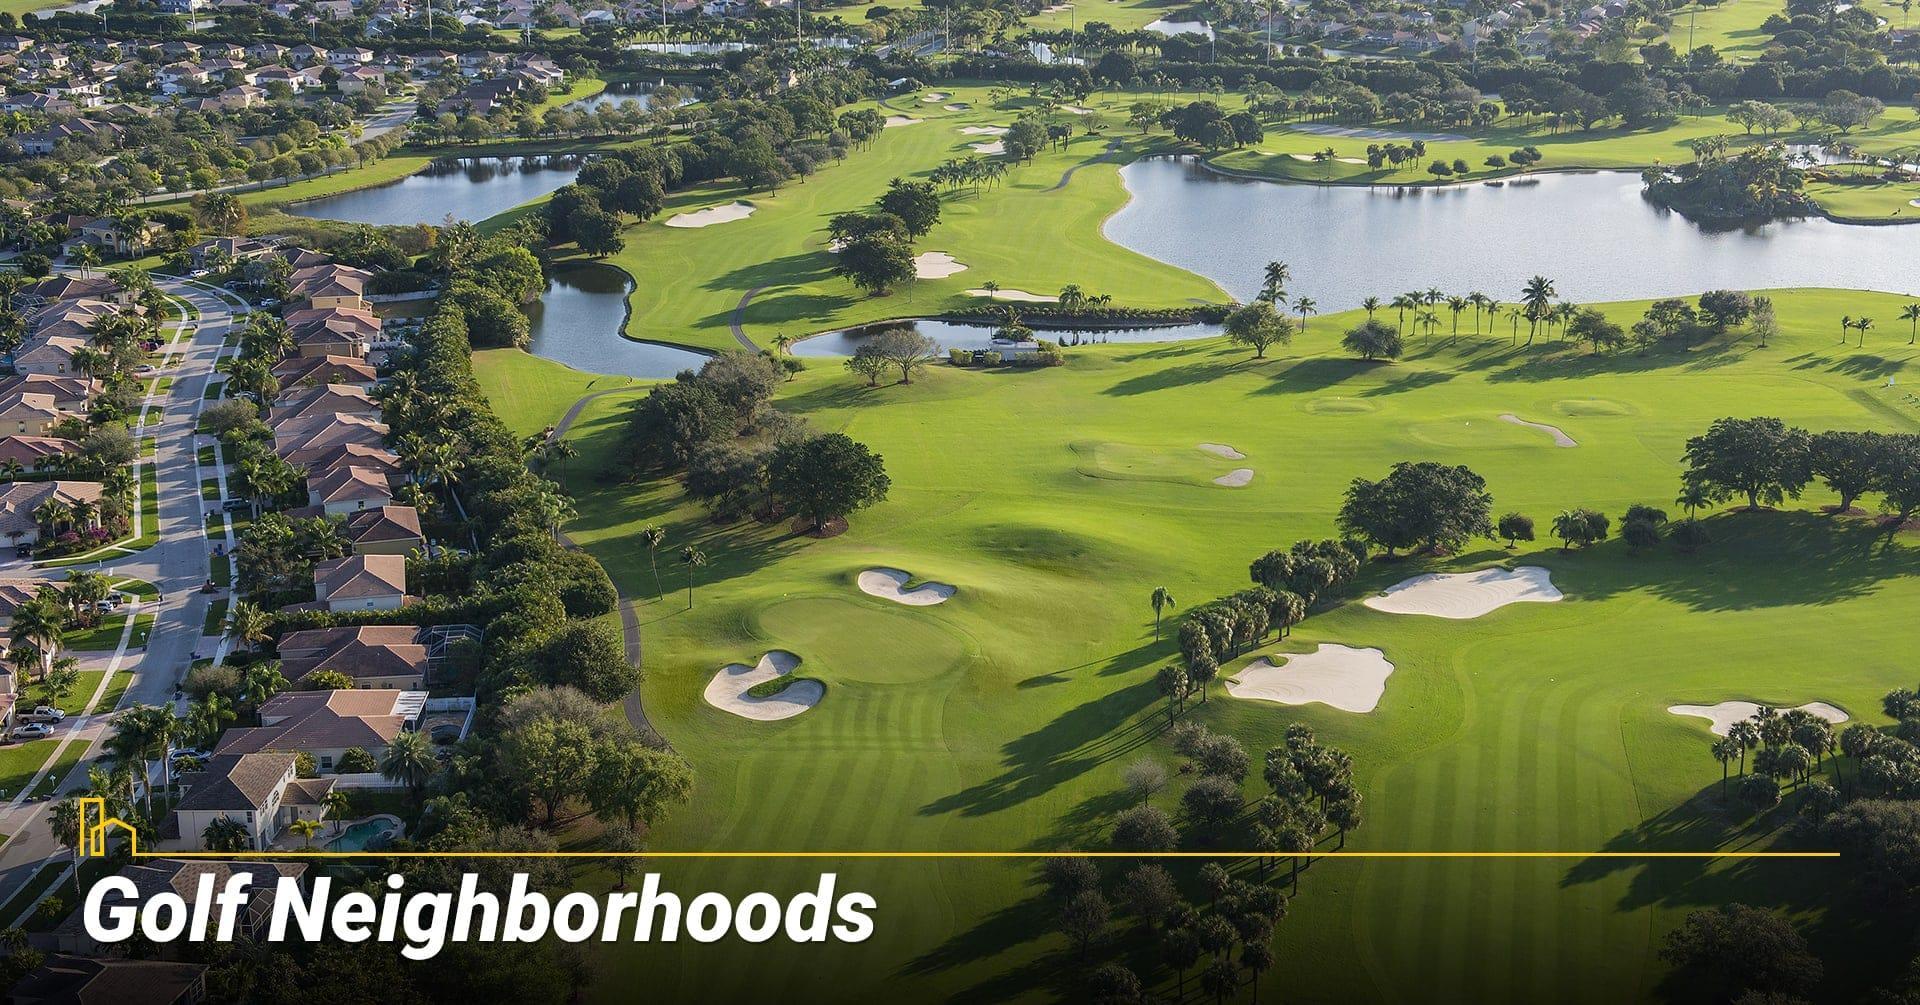 Golf Neighborhoods, living next to a golf course